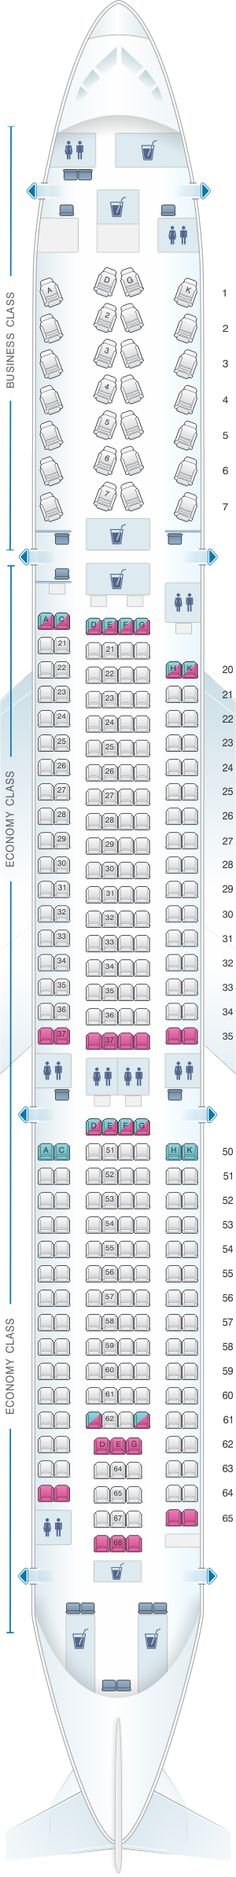 Seat Map Lufthansa Airbus A340 600 281pax   Lufthansa ...